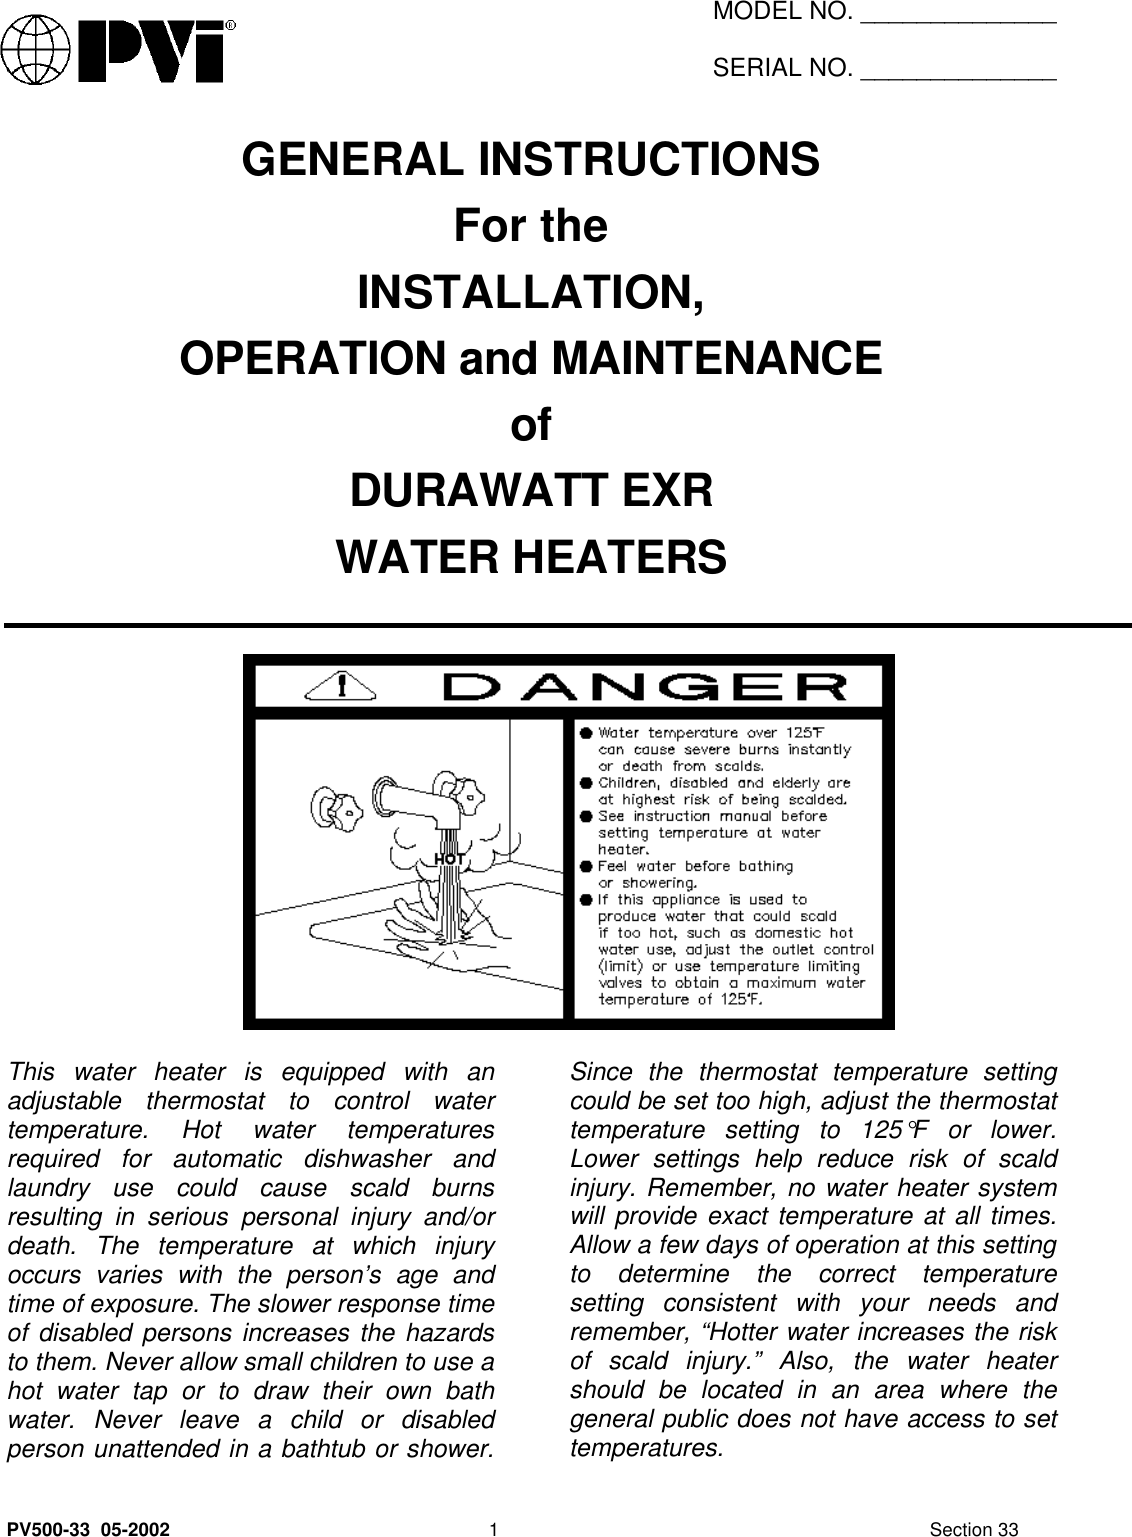 pvi industries water heater users manual pv500 33 0p3h rh usermanual wiki PVI Haddonfield NJ High School PVI Haddonfield NJ High School